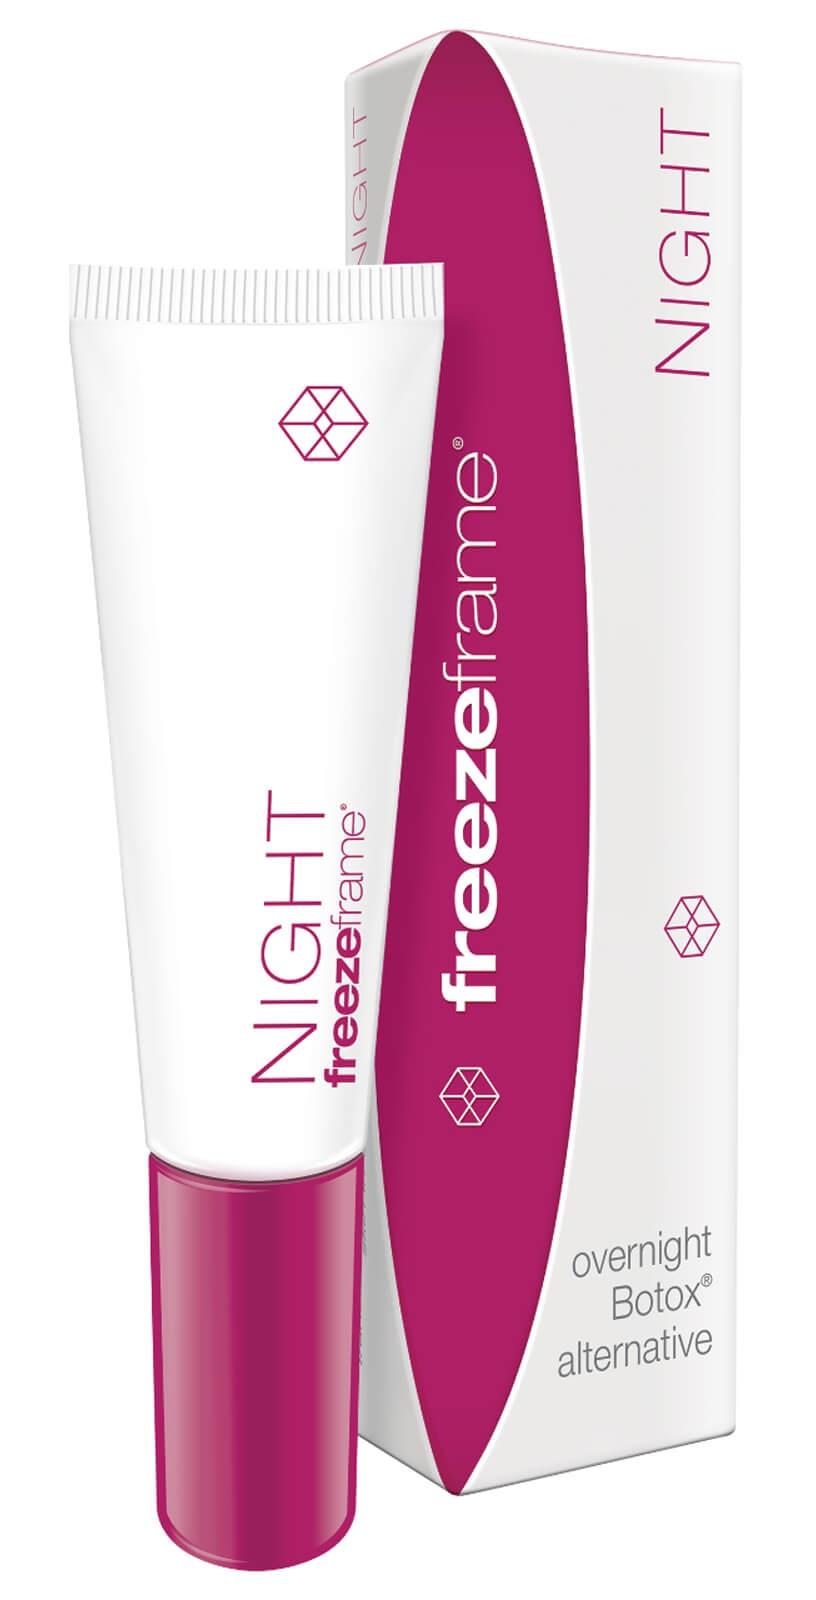 Freezeframe Night No Needle Topical Micro Injection